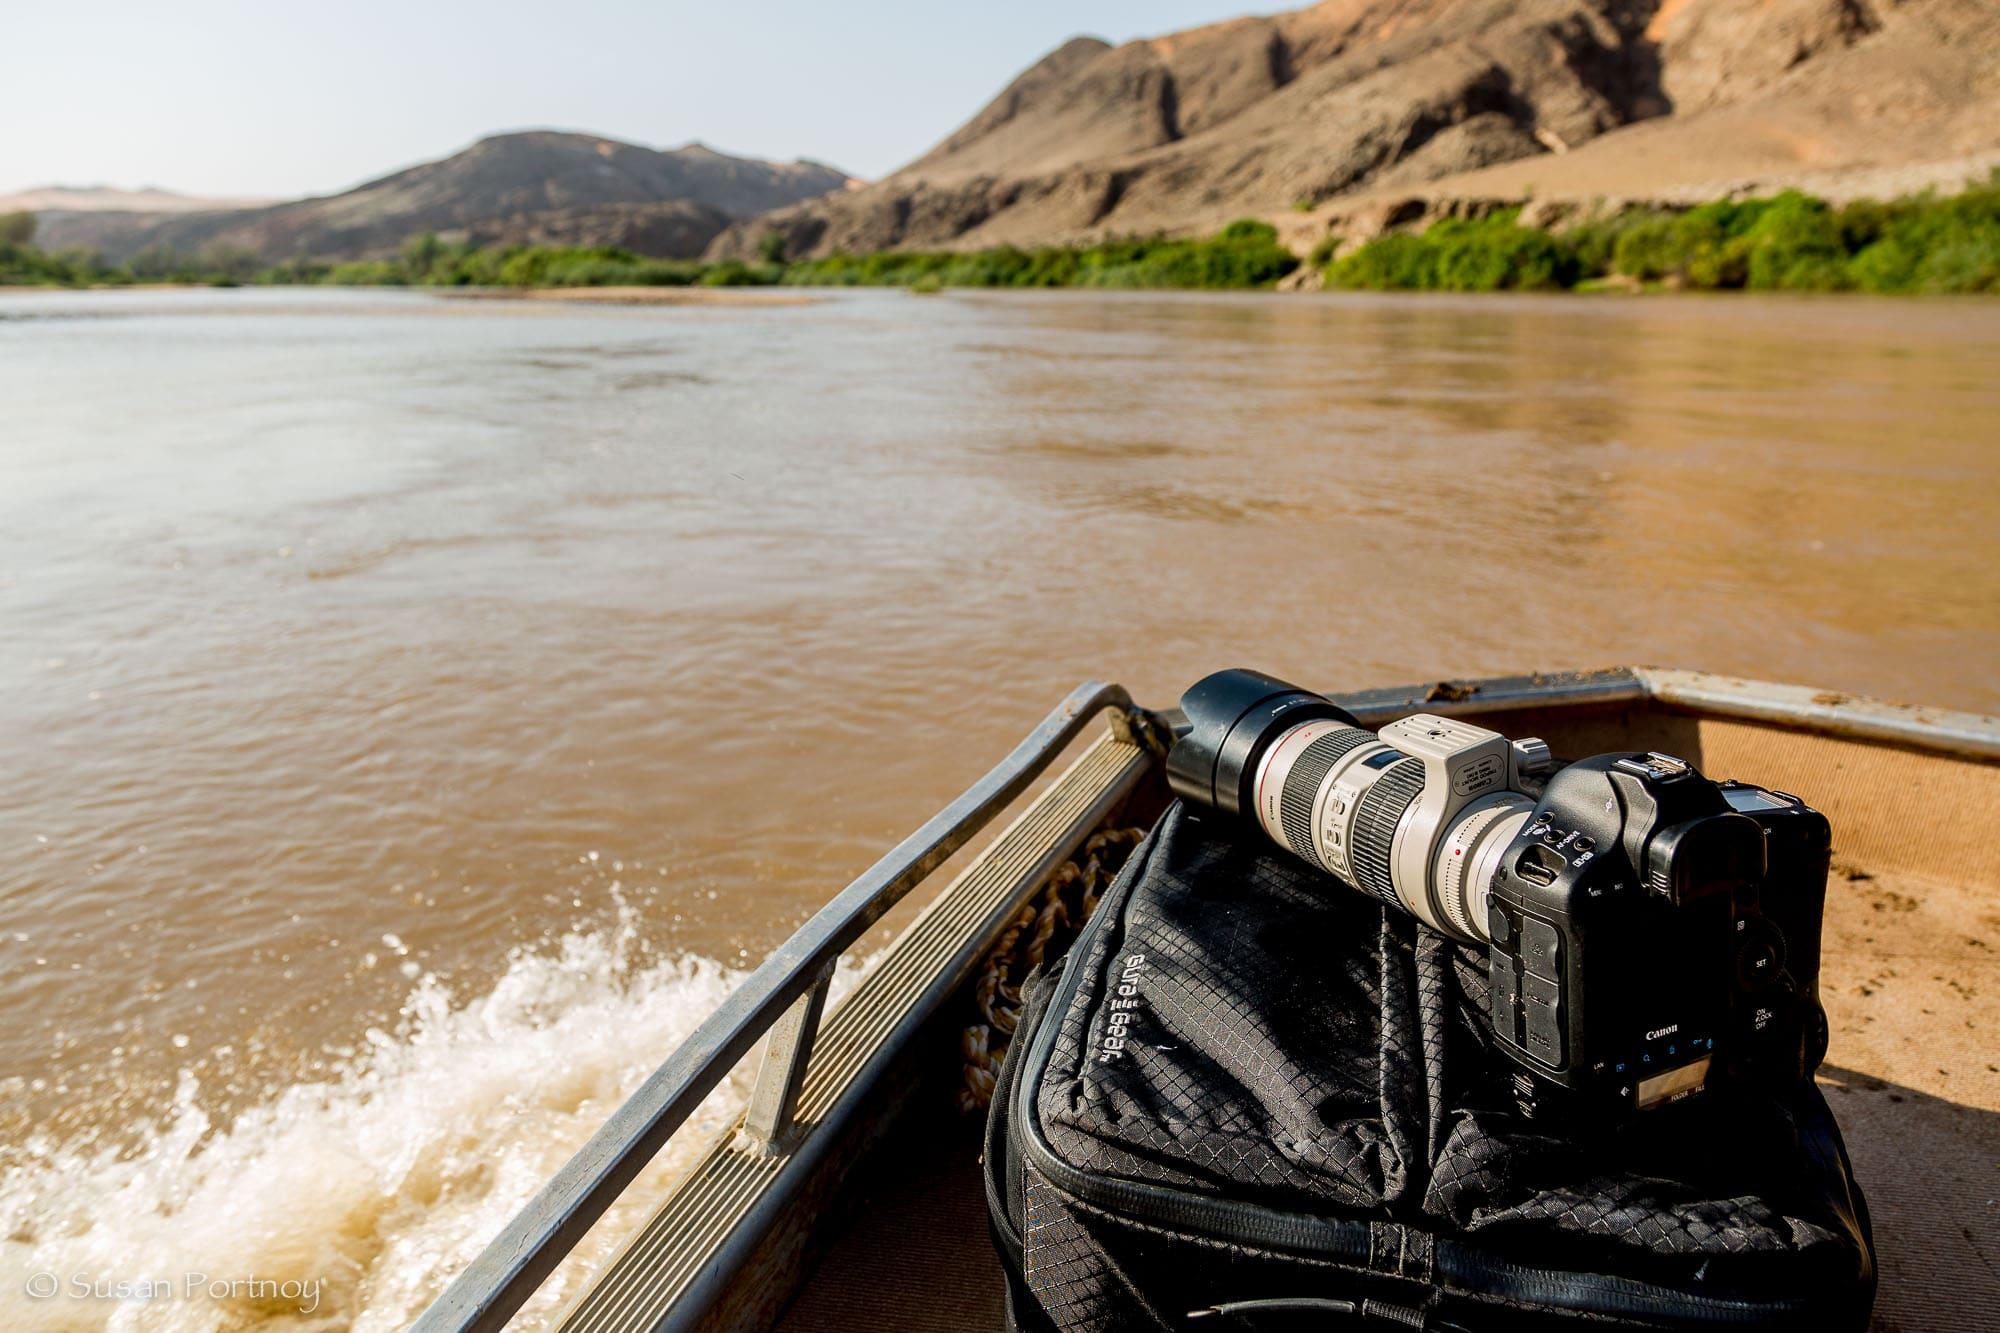 Gura Gear Bataflae 32L with me in Namibia